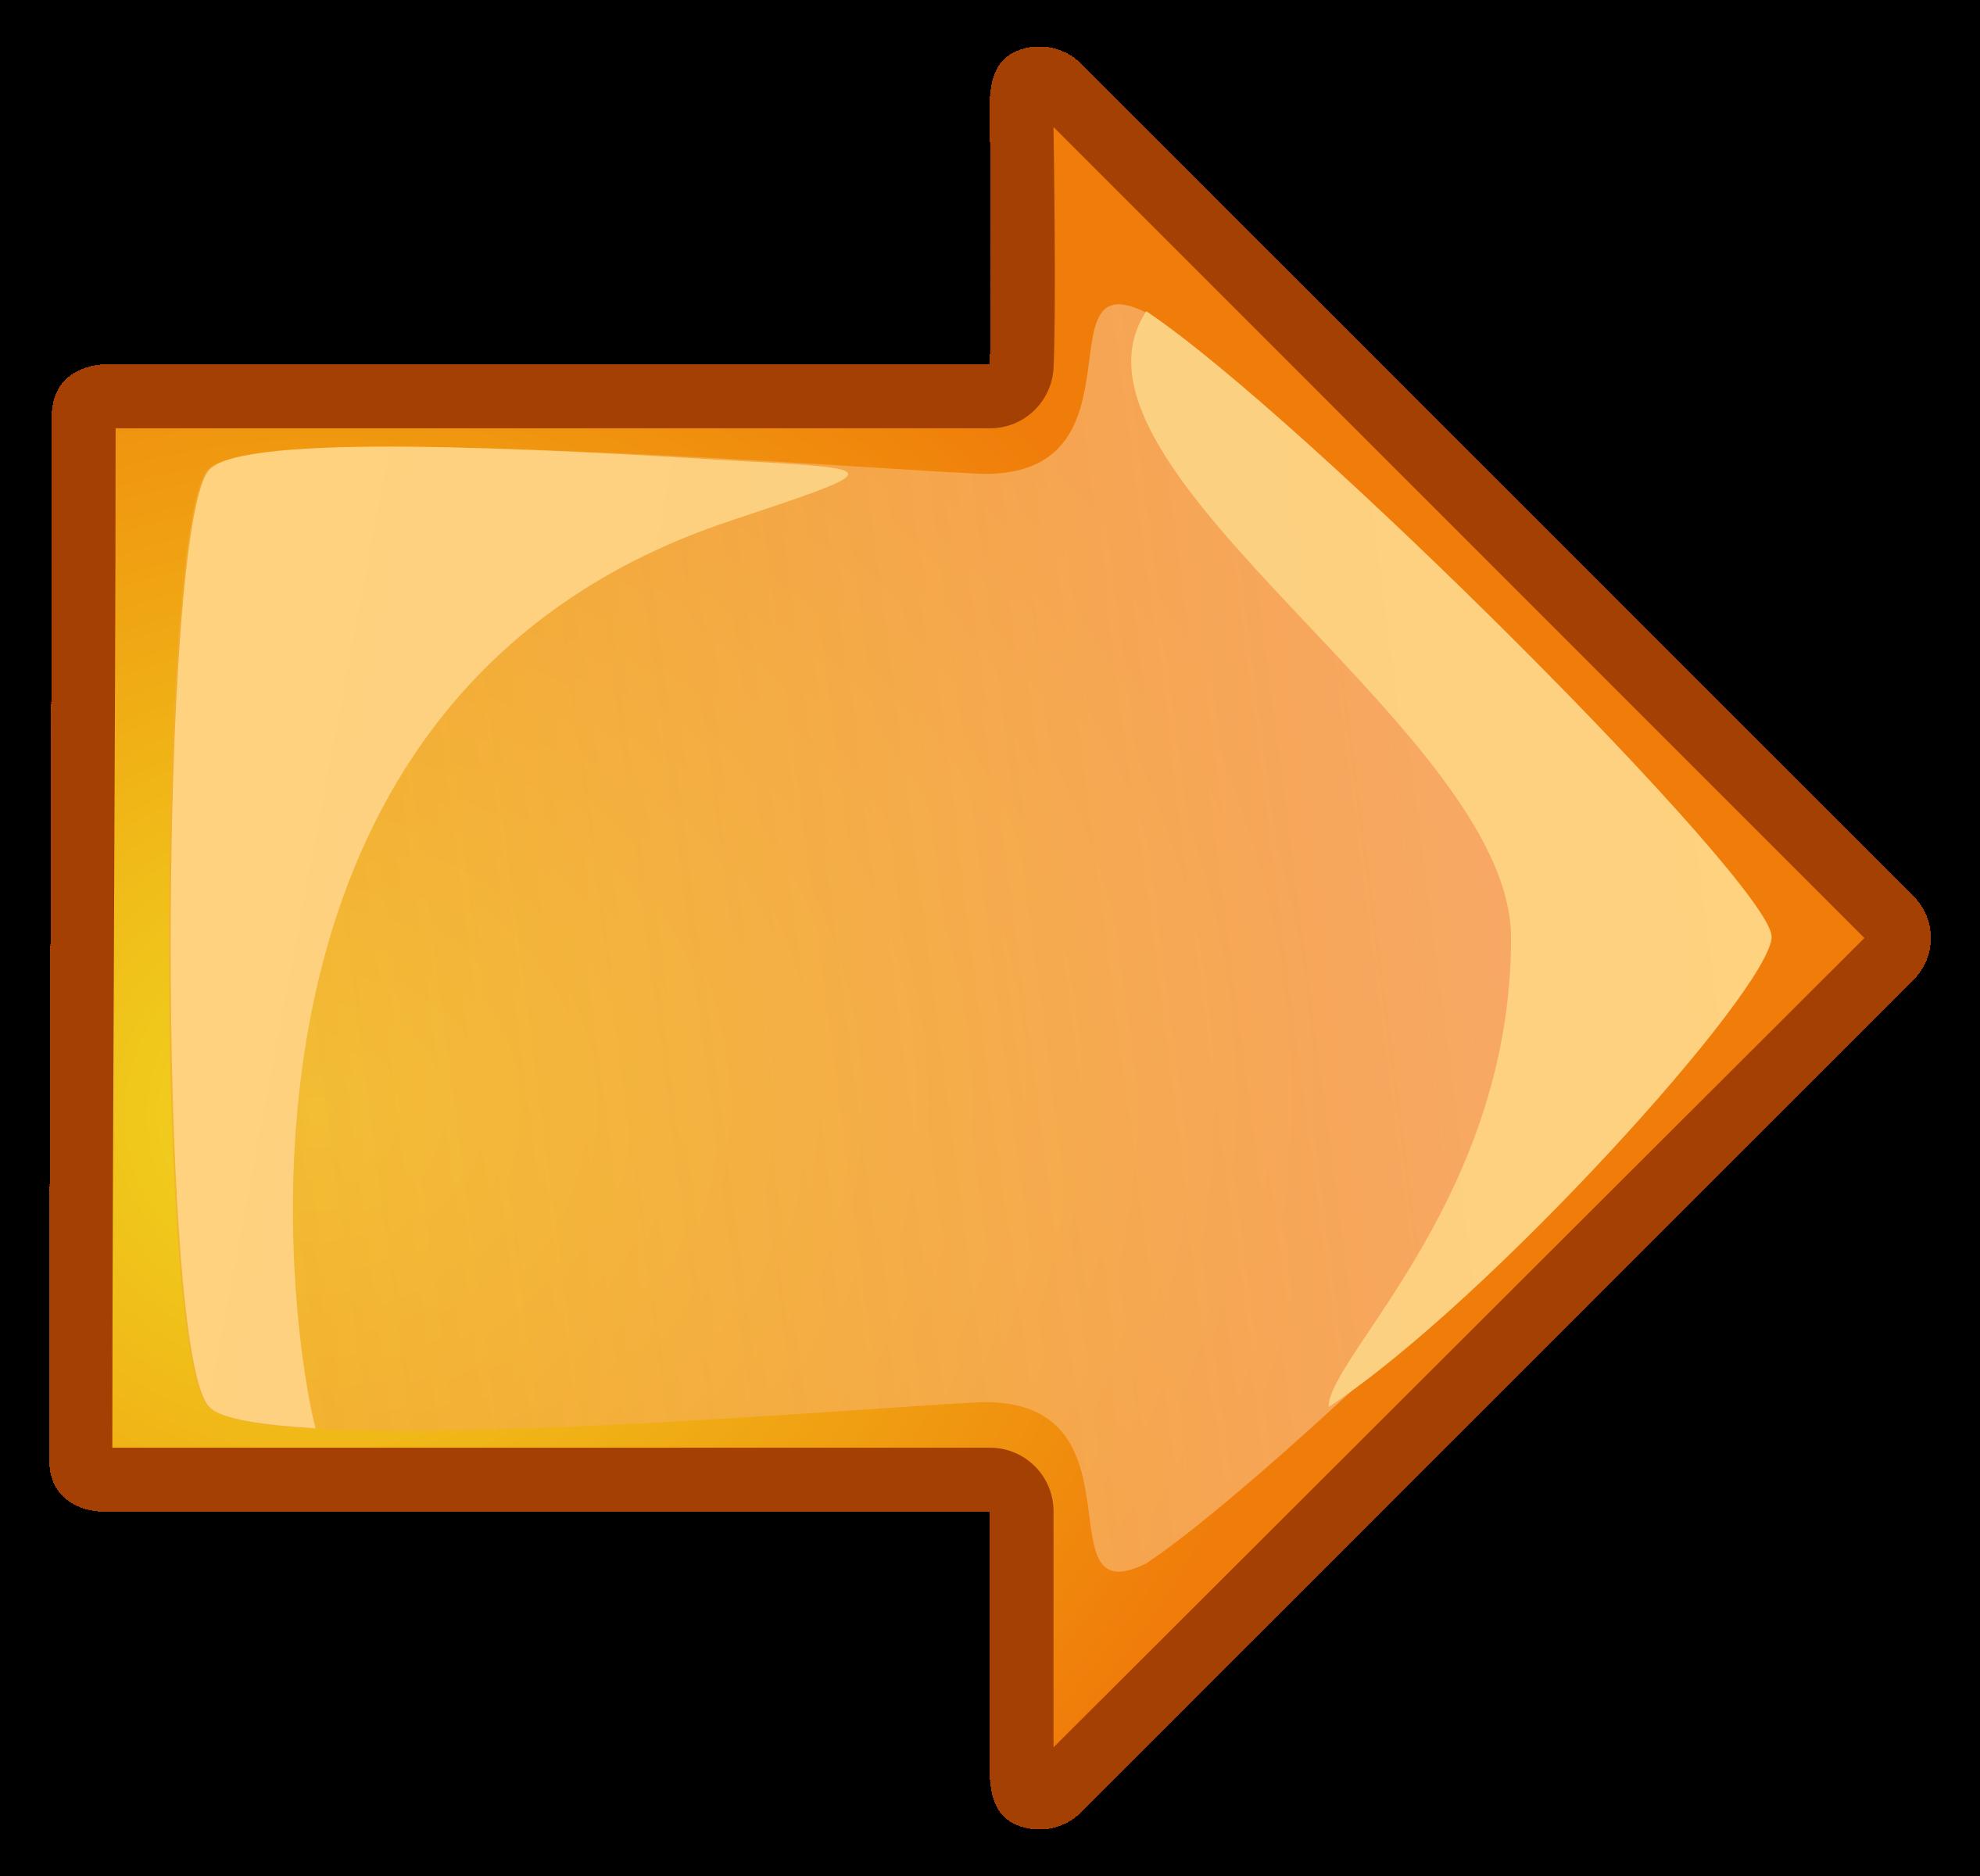 Right big image png. Clipart arrow orange